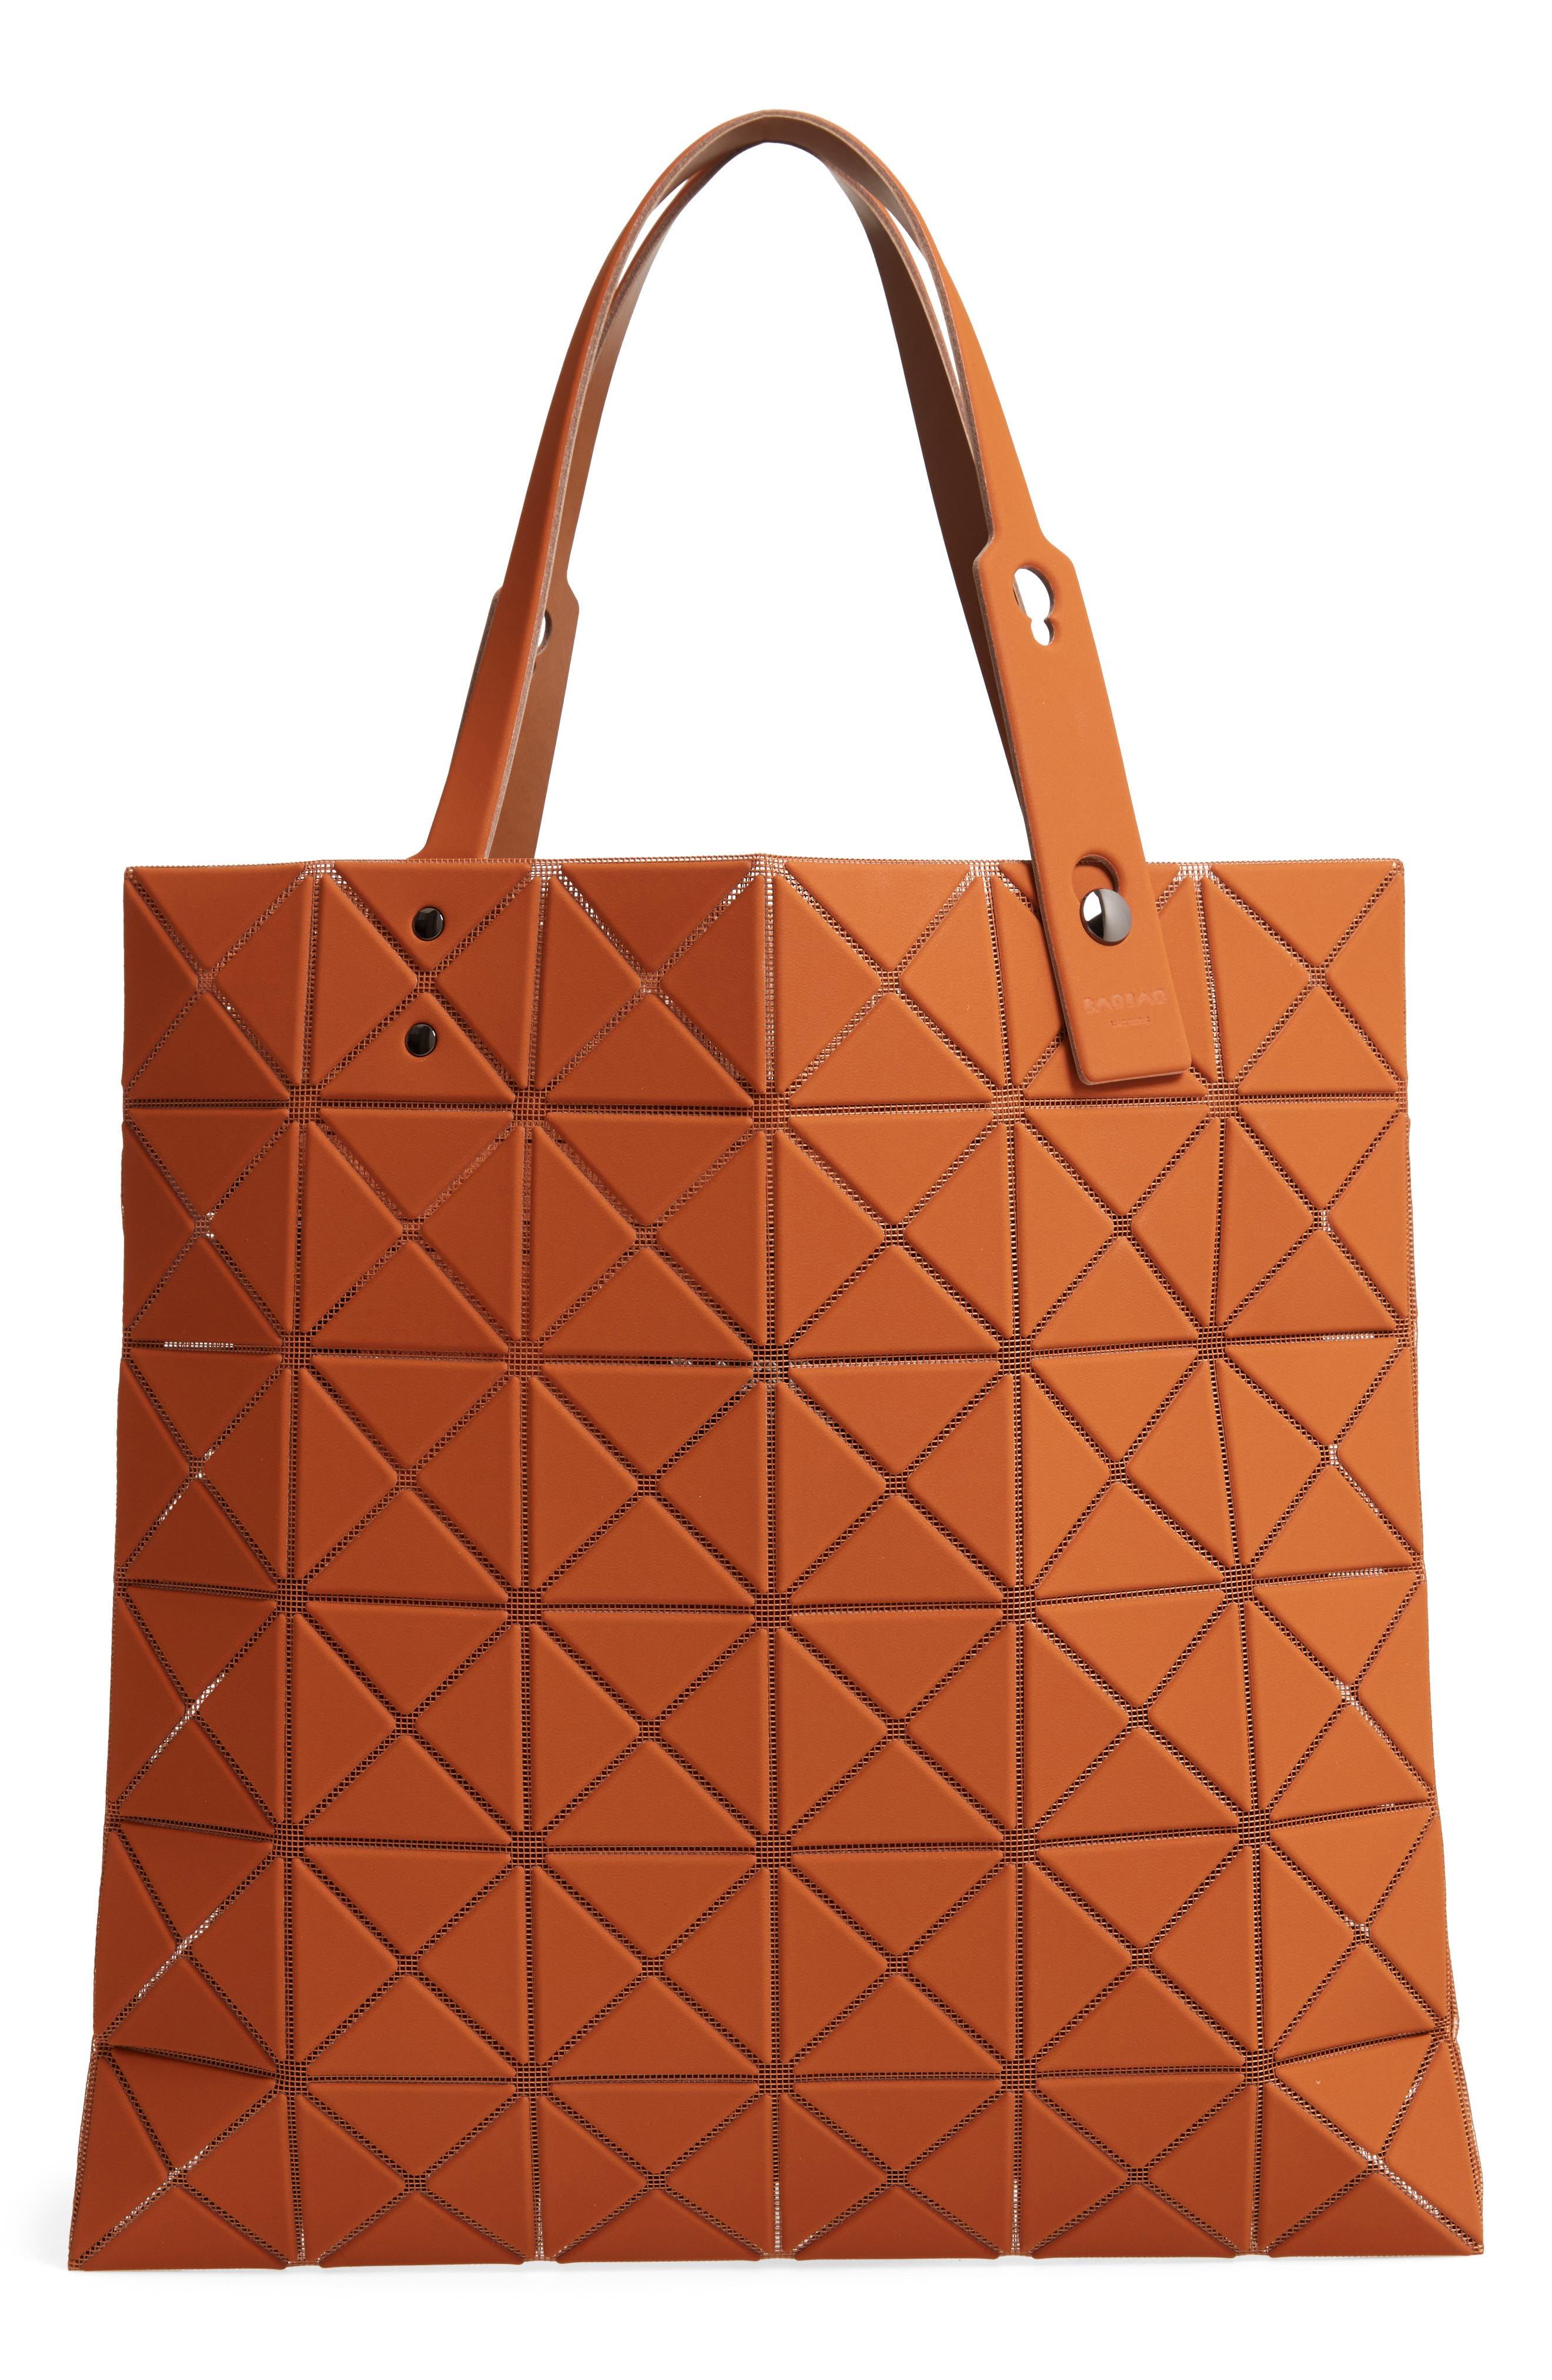 Lucent Prism Tote Bag,                         Main,                         color, CAMEL